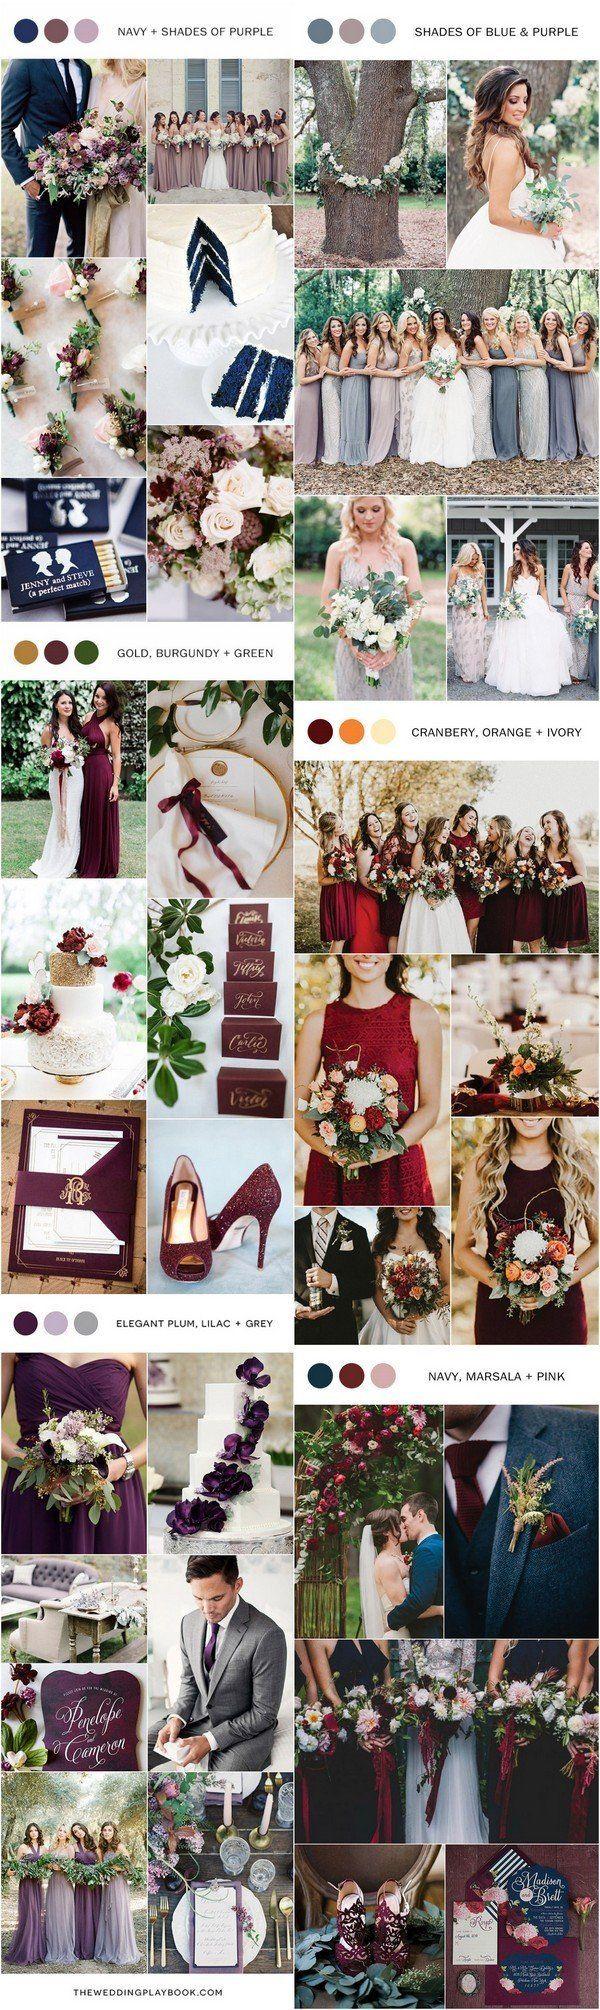 Wedding decorations using pallets october 2018  Amazing Fall Wedding Ideas for   Wedding  Pinterest